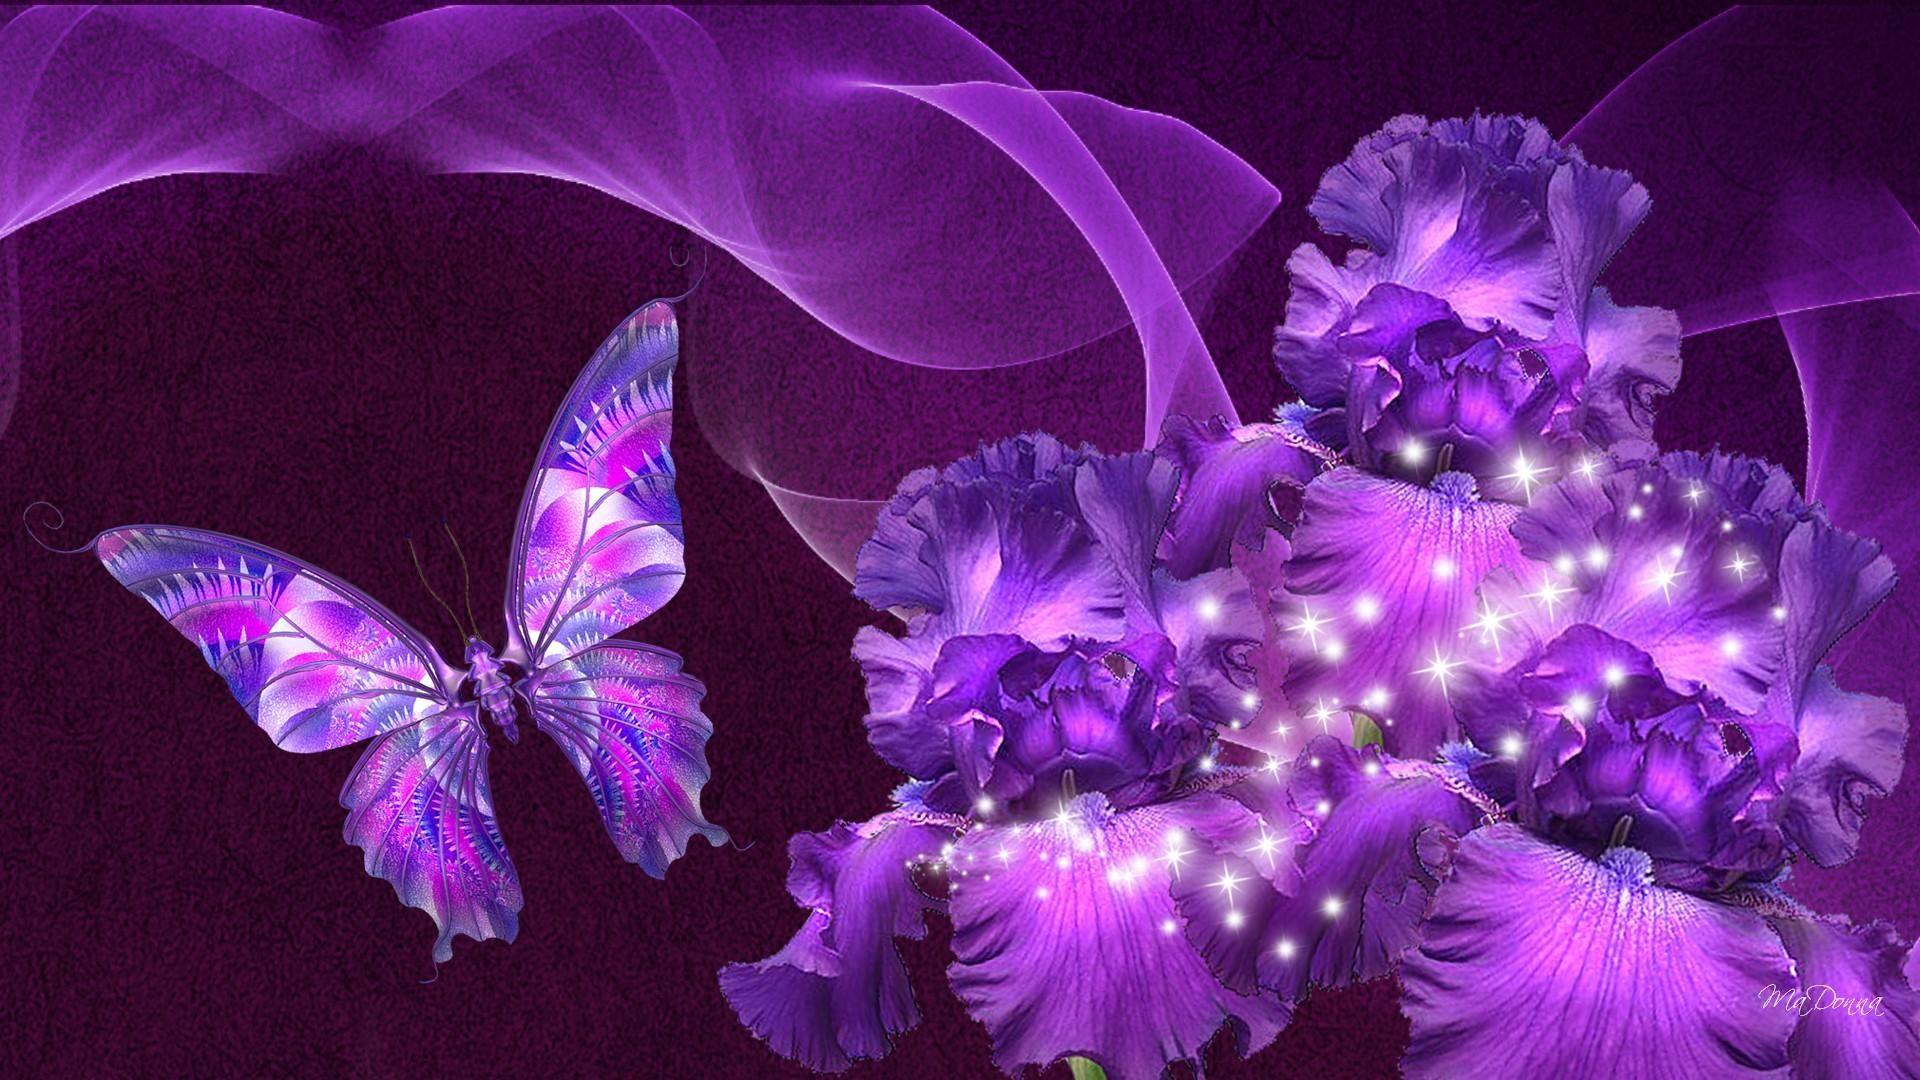 Animal Wallpaper: Purple Butterfly Wallpaper Desktop with High Resolution